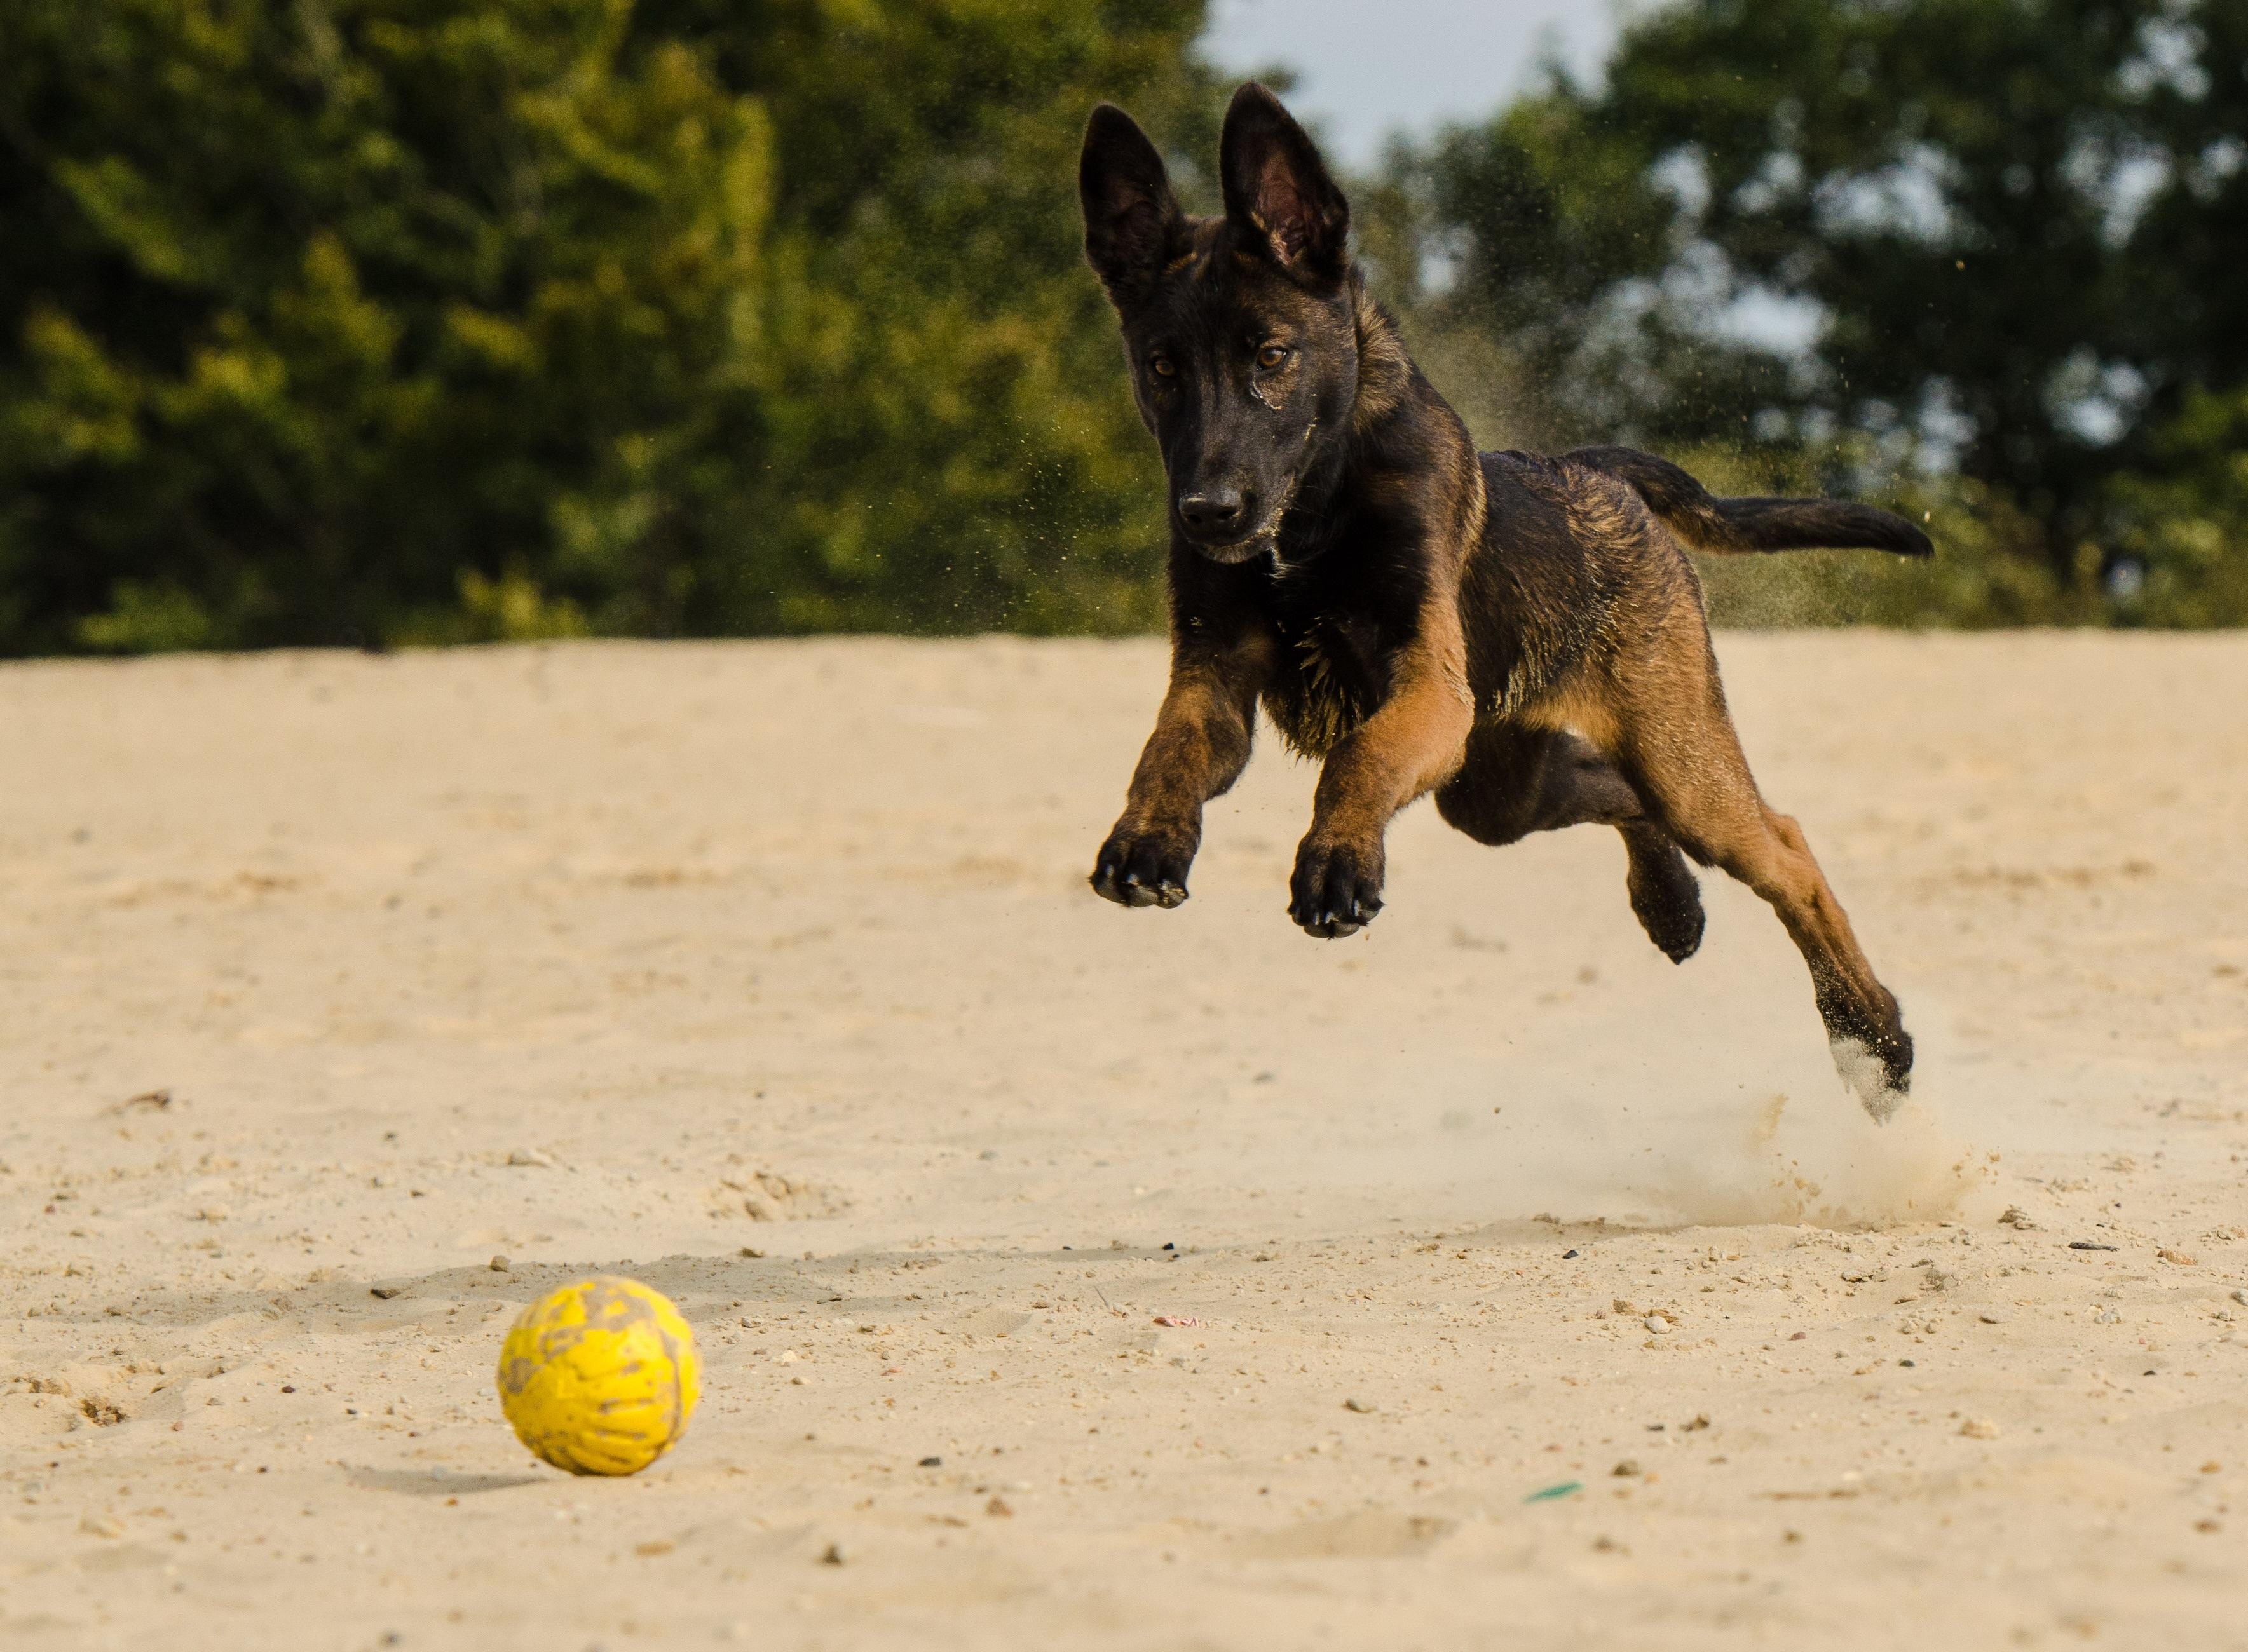 Ball motion recording running dog